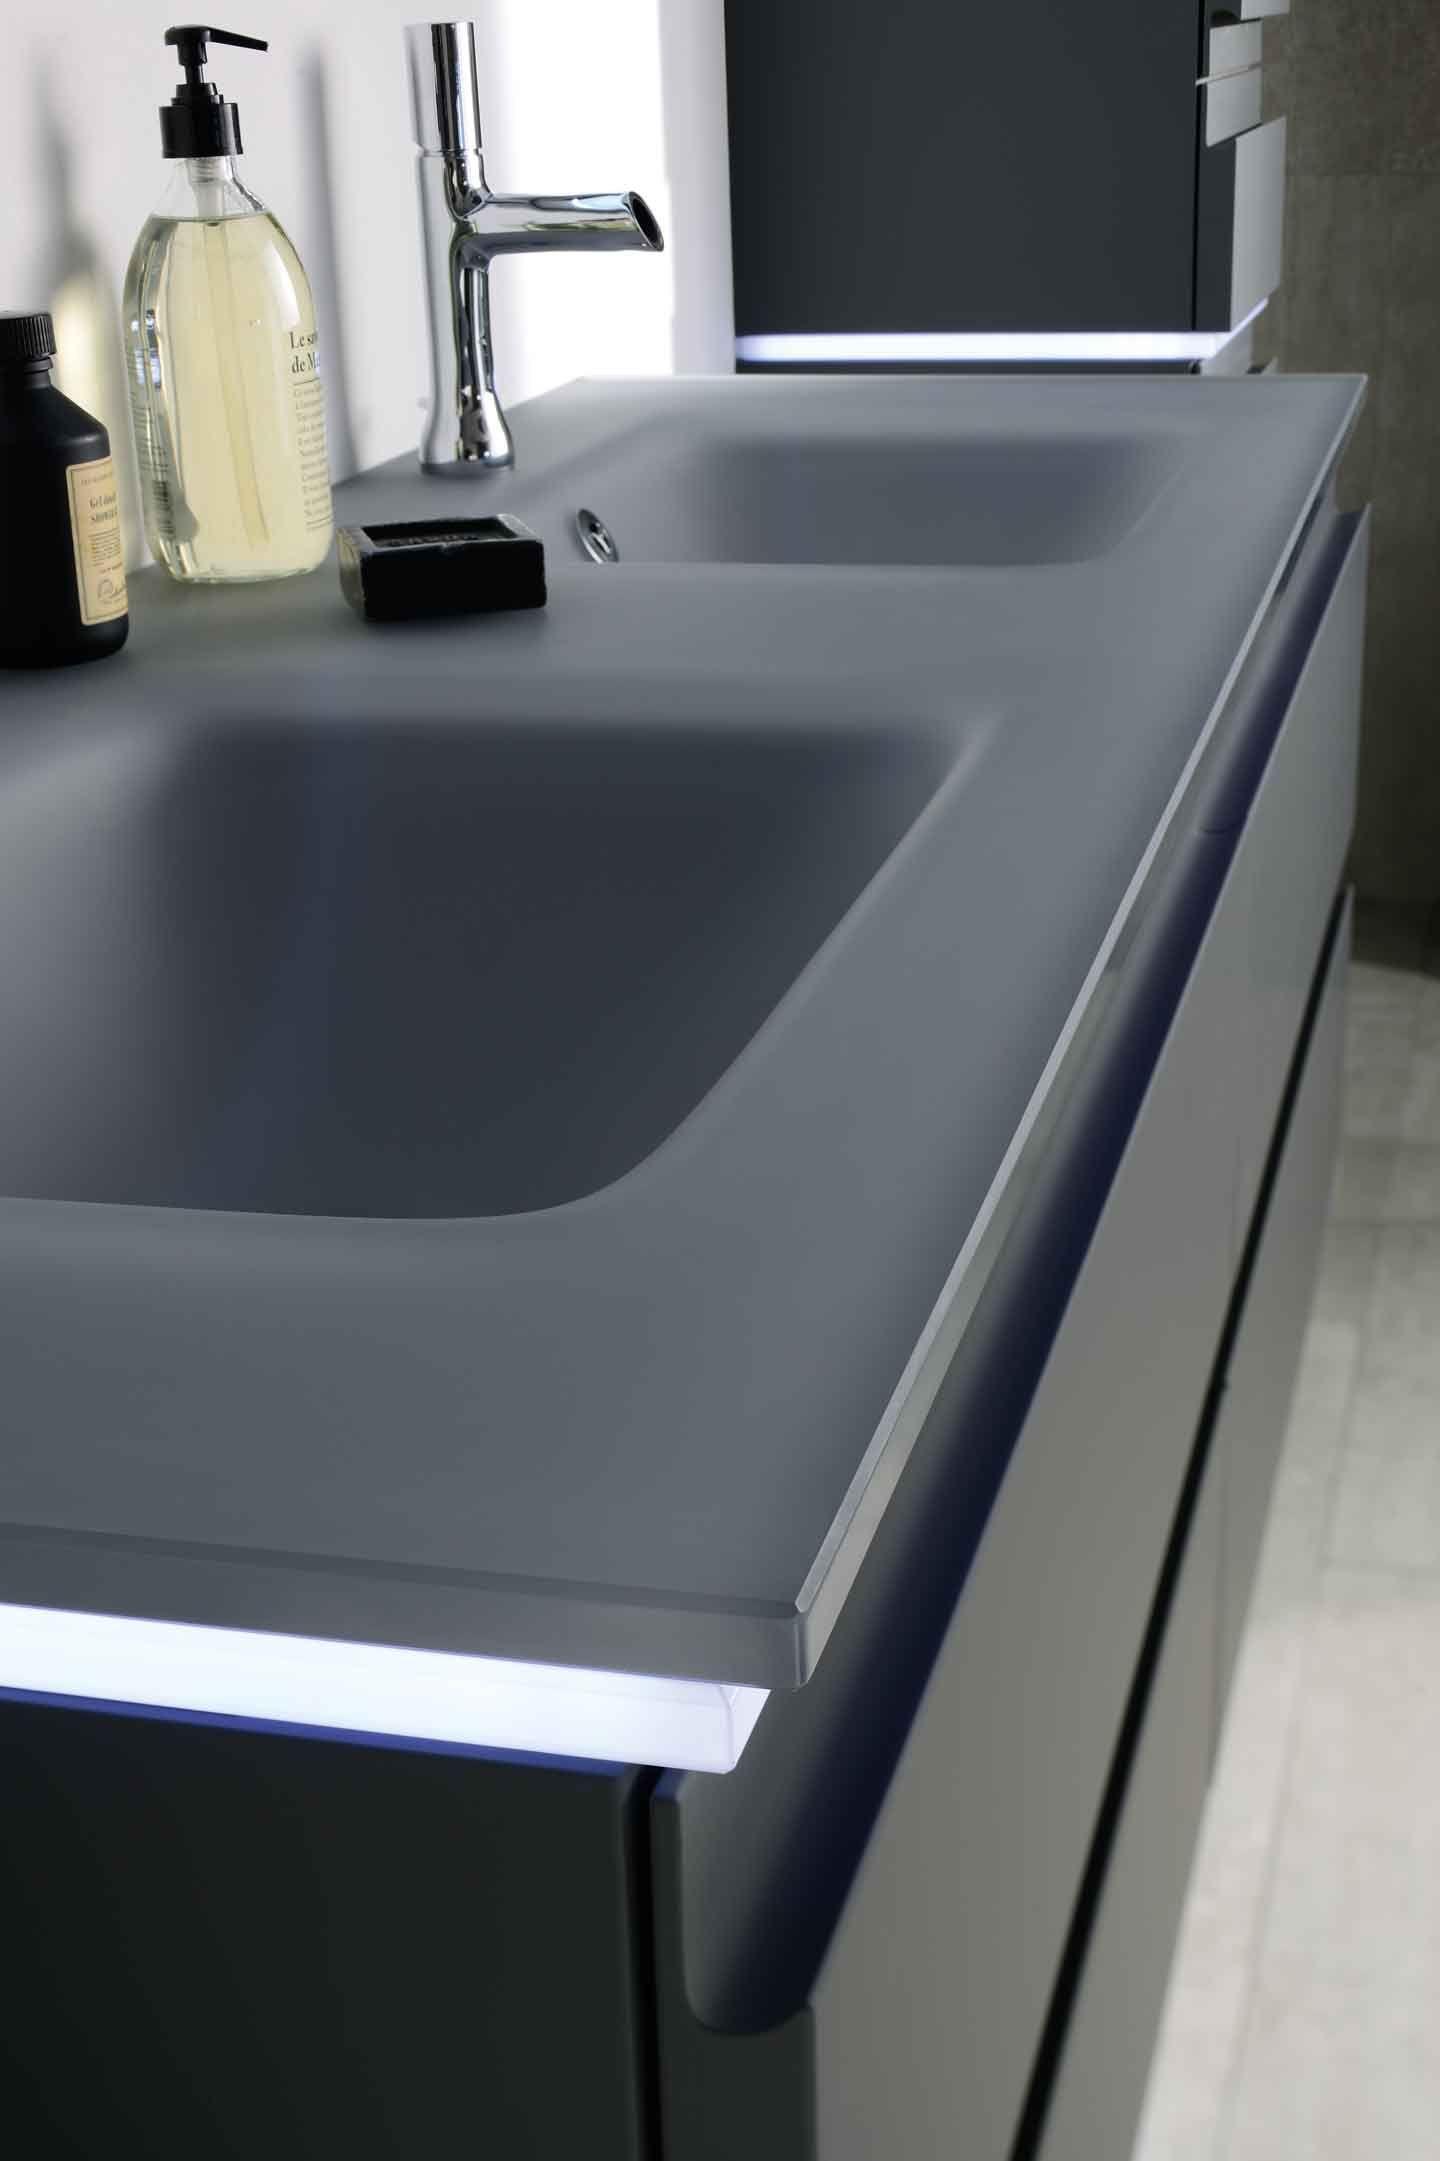 vasque a poser grise 2 meuble halo, Sanijura, Plan vasque en verre gris givré